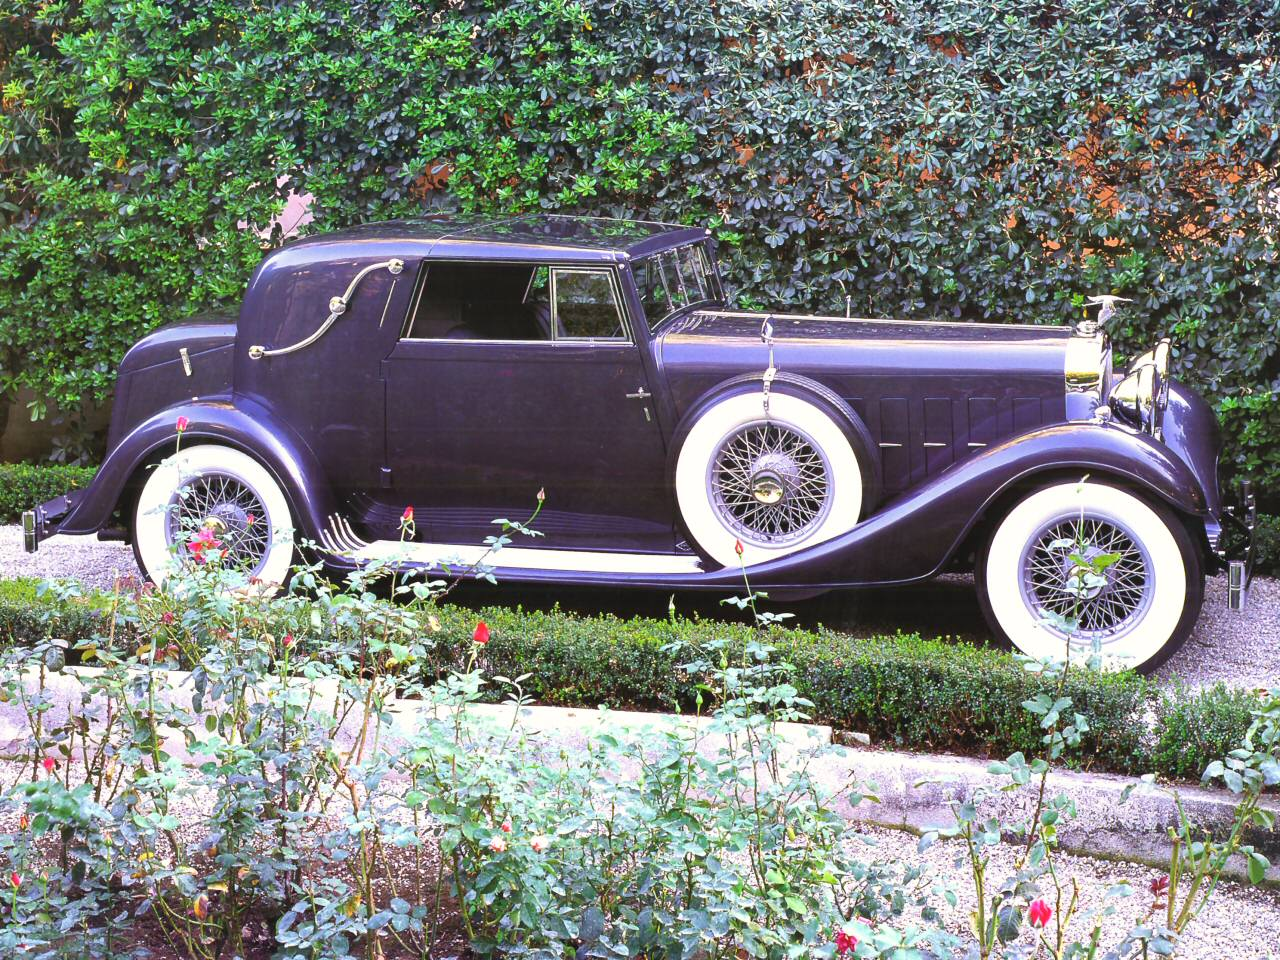 1933 Hispano Suiza J12 V 12 Coupe DeVille Body By Binder W Removeable Hardtop Dark Grey Svr